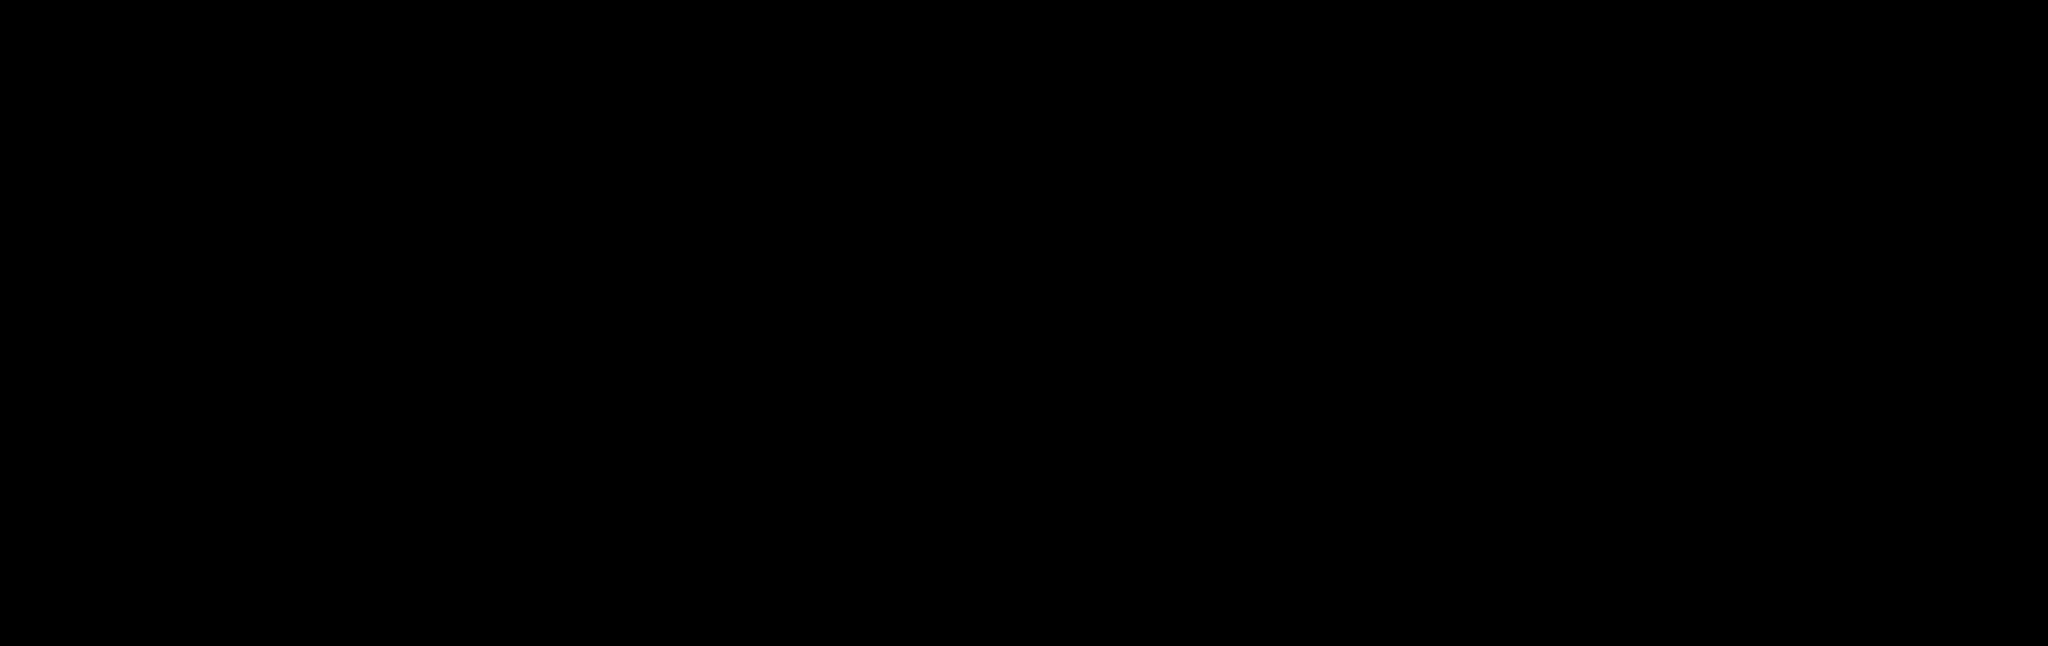 direct logo